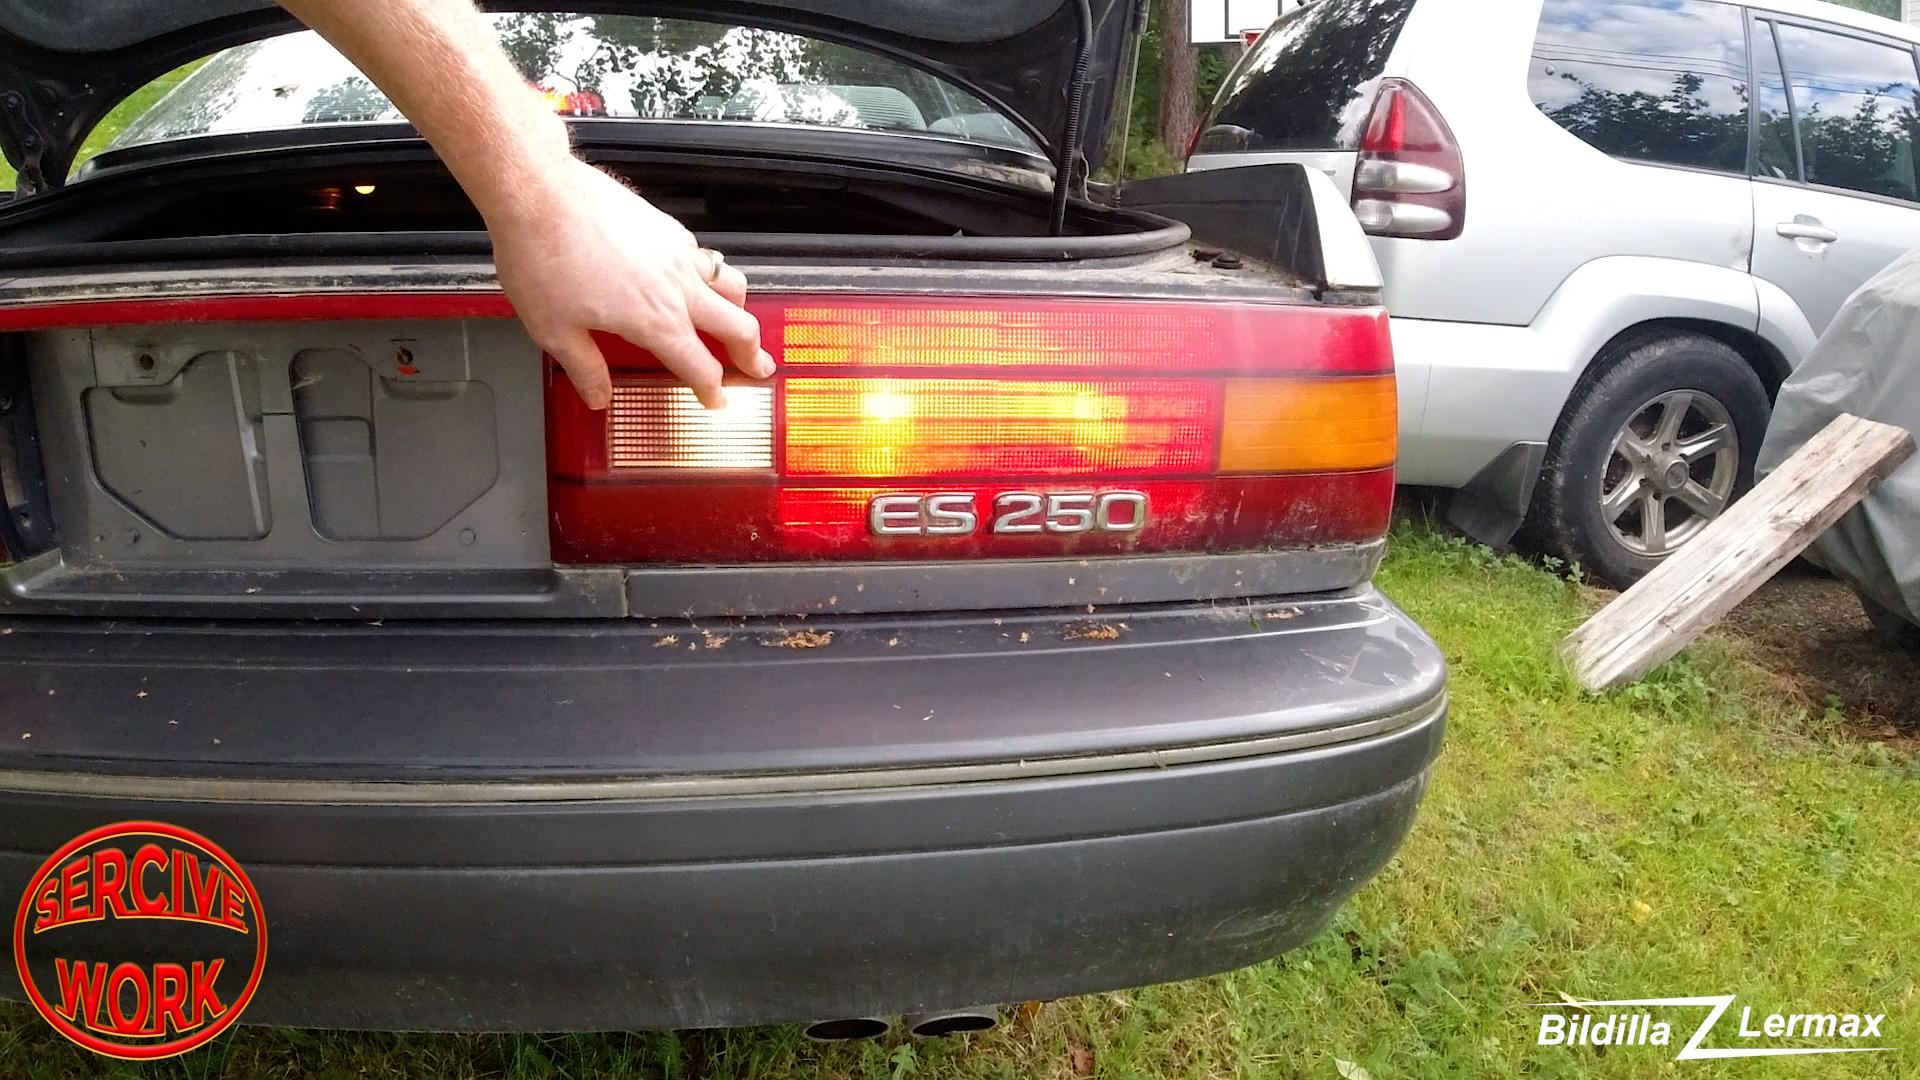 1991 Lexus ES 250 – baklys fiks